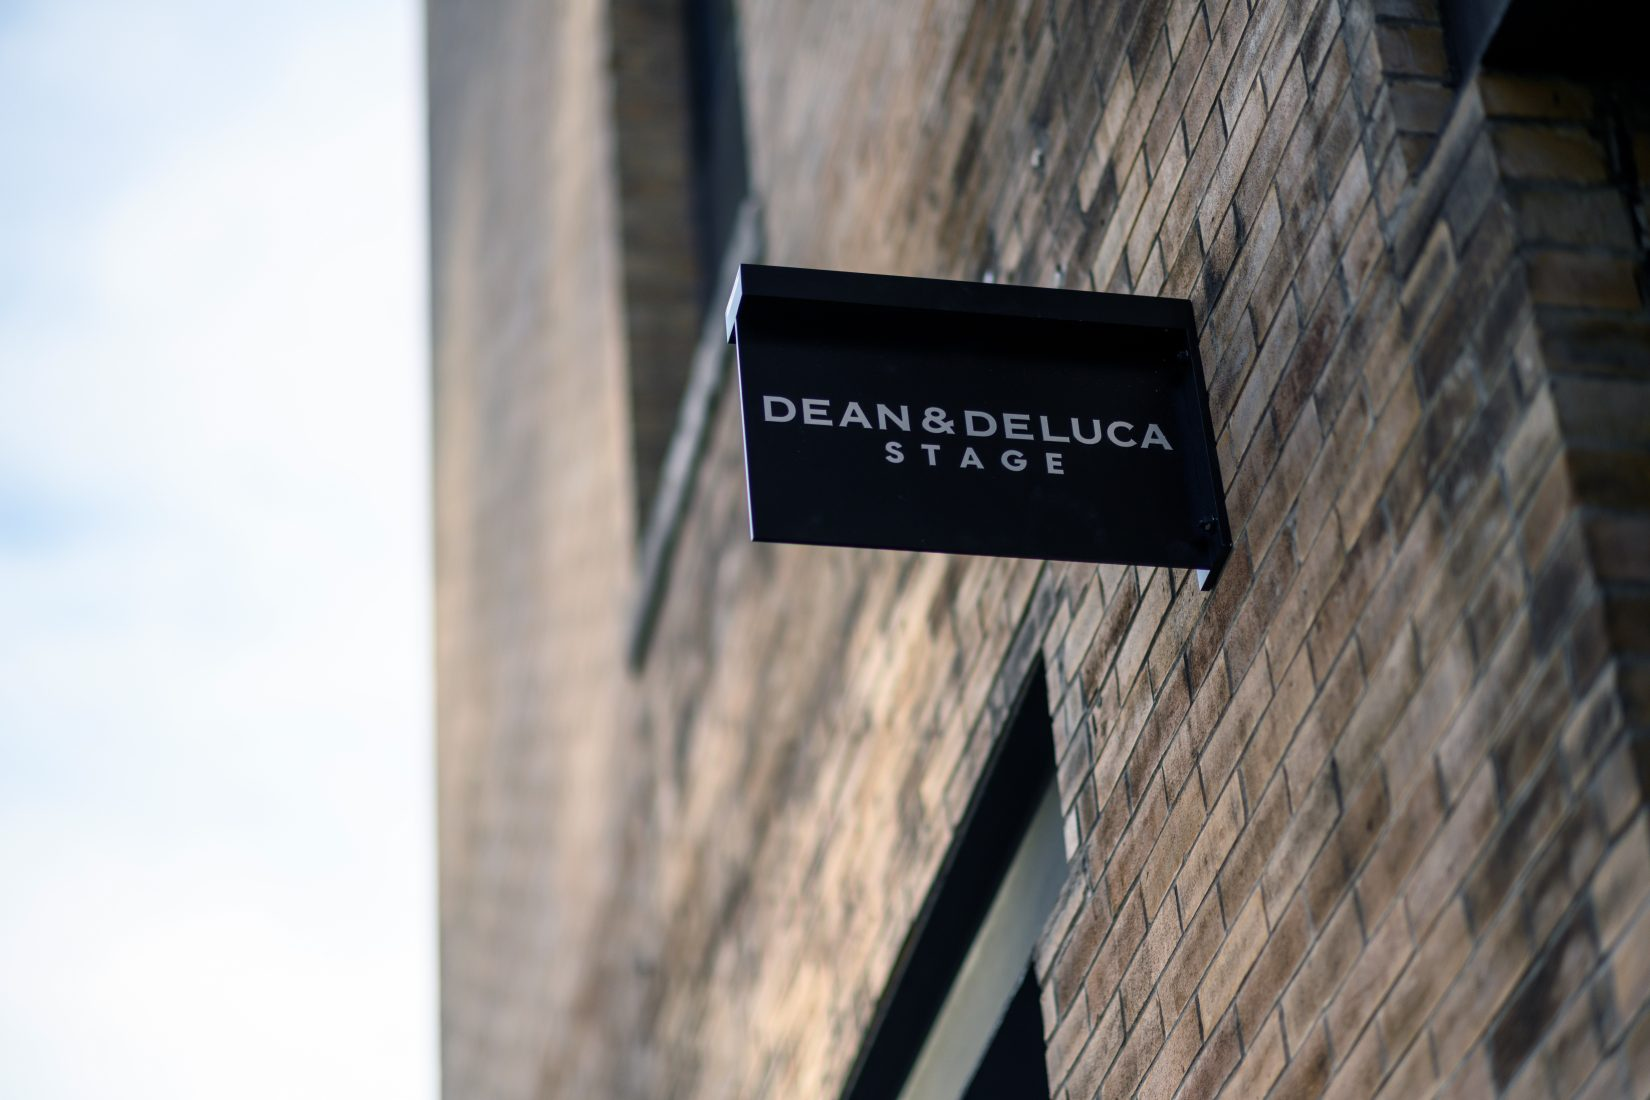 Dean & DeLuca Presents New Concept 'STAGE'